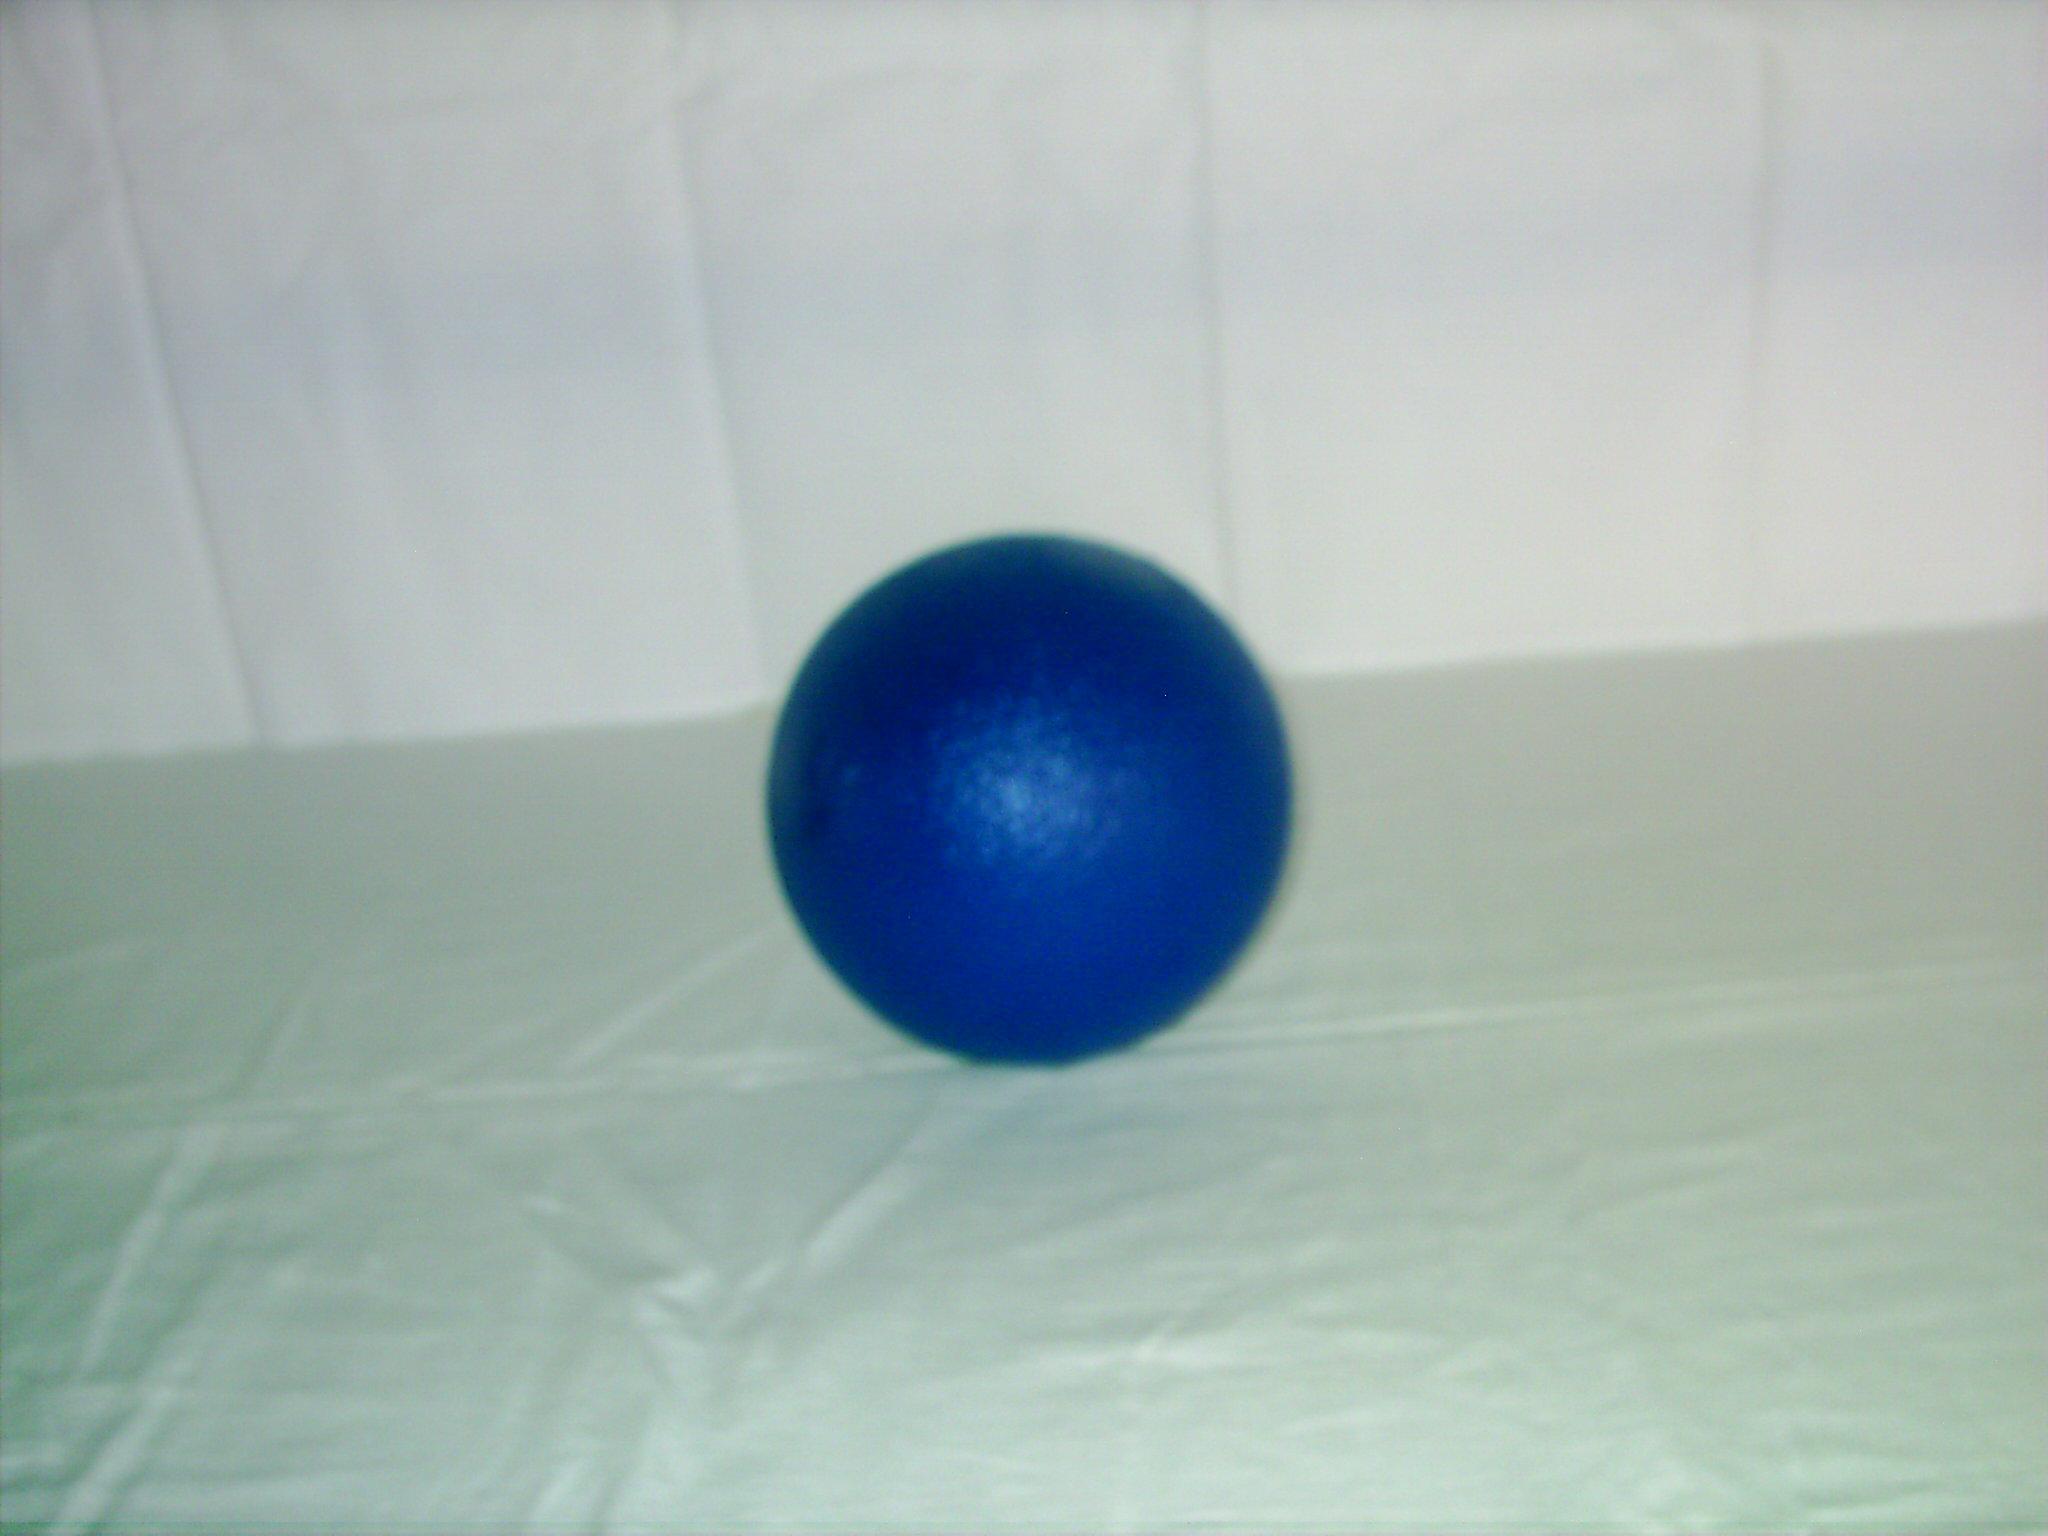 B005 Blauwe soft bal